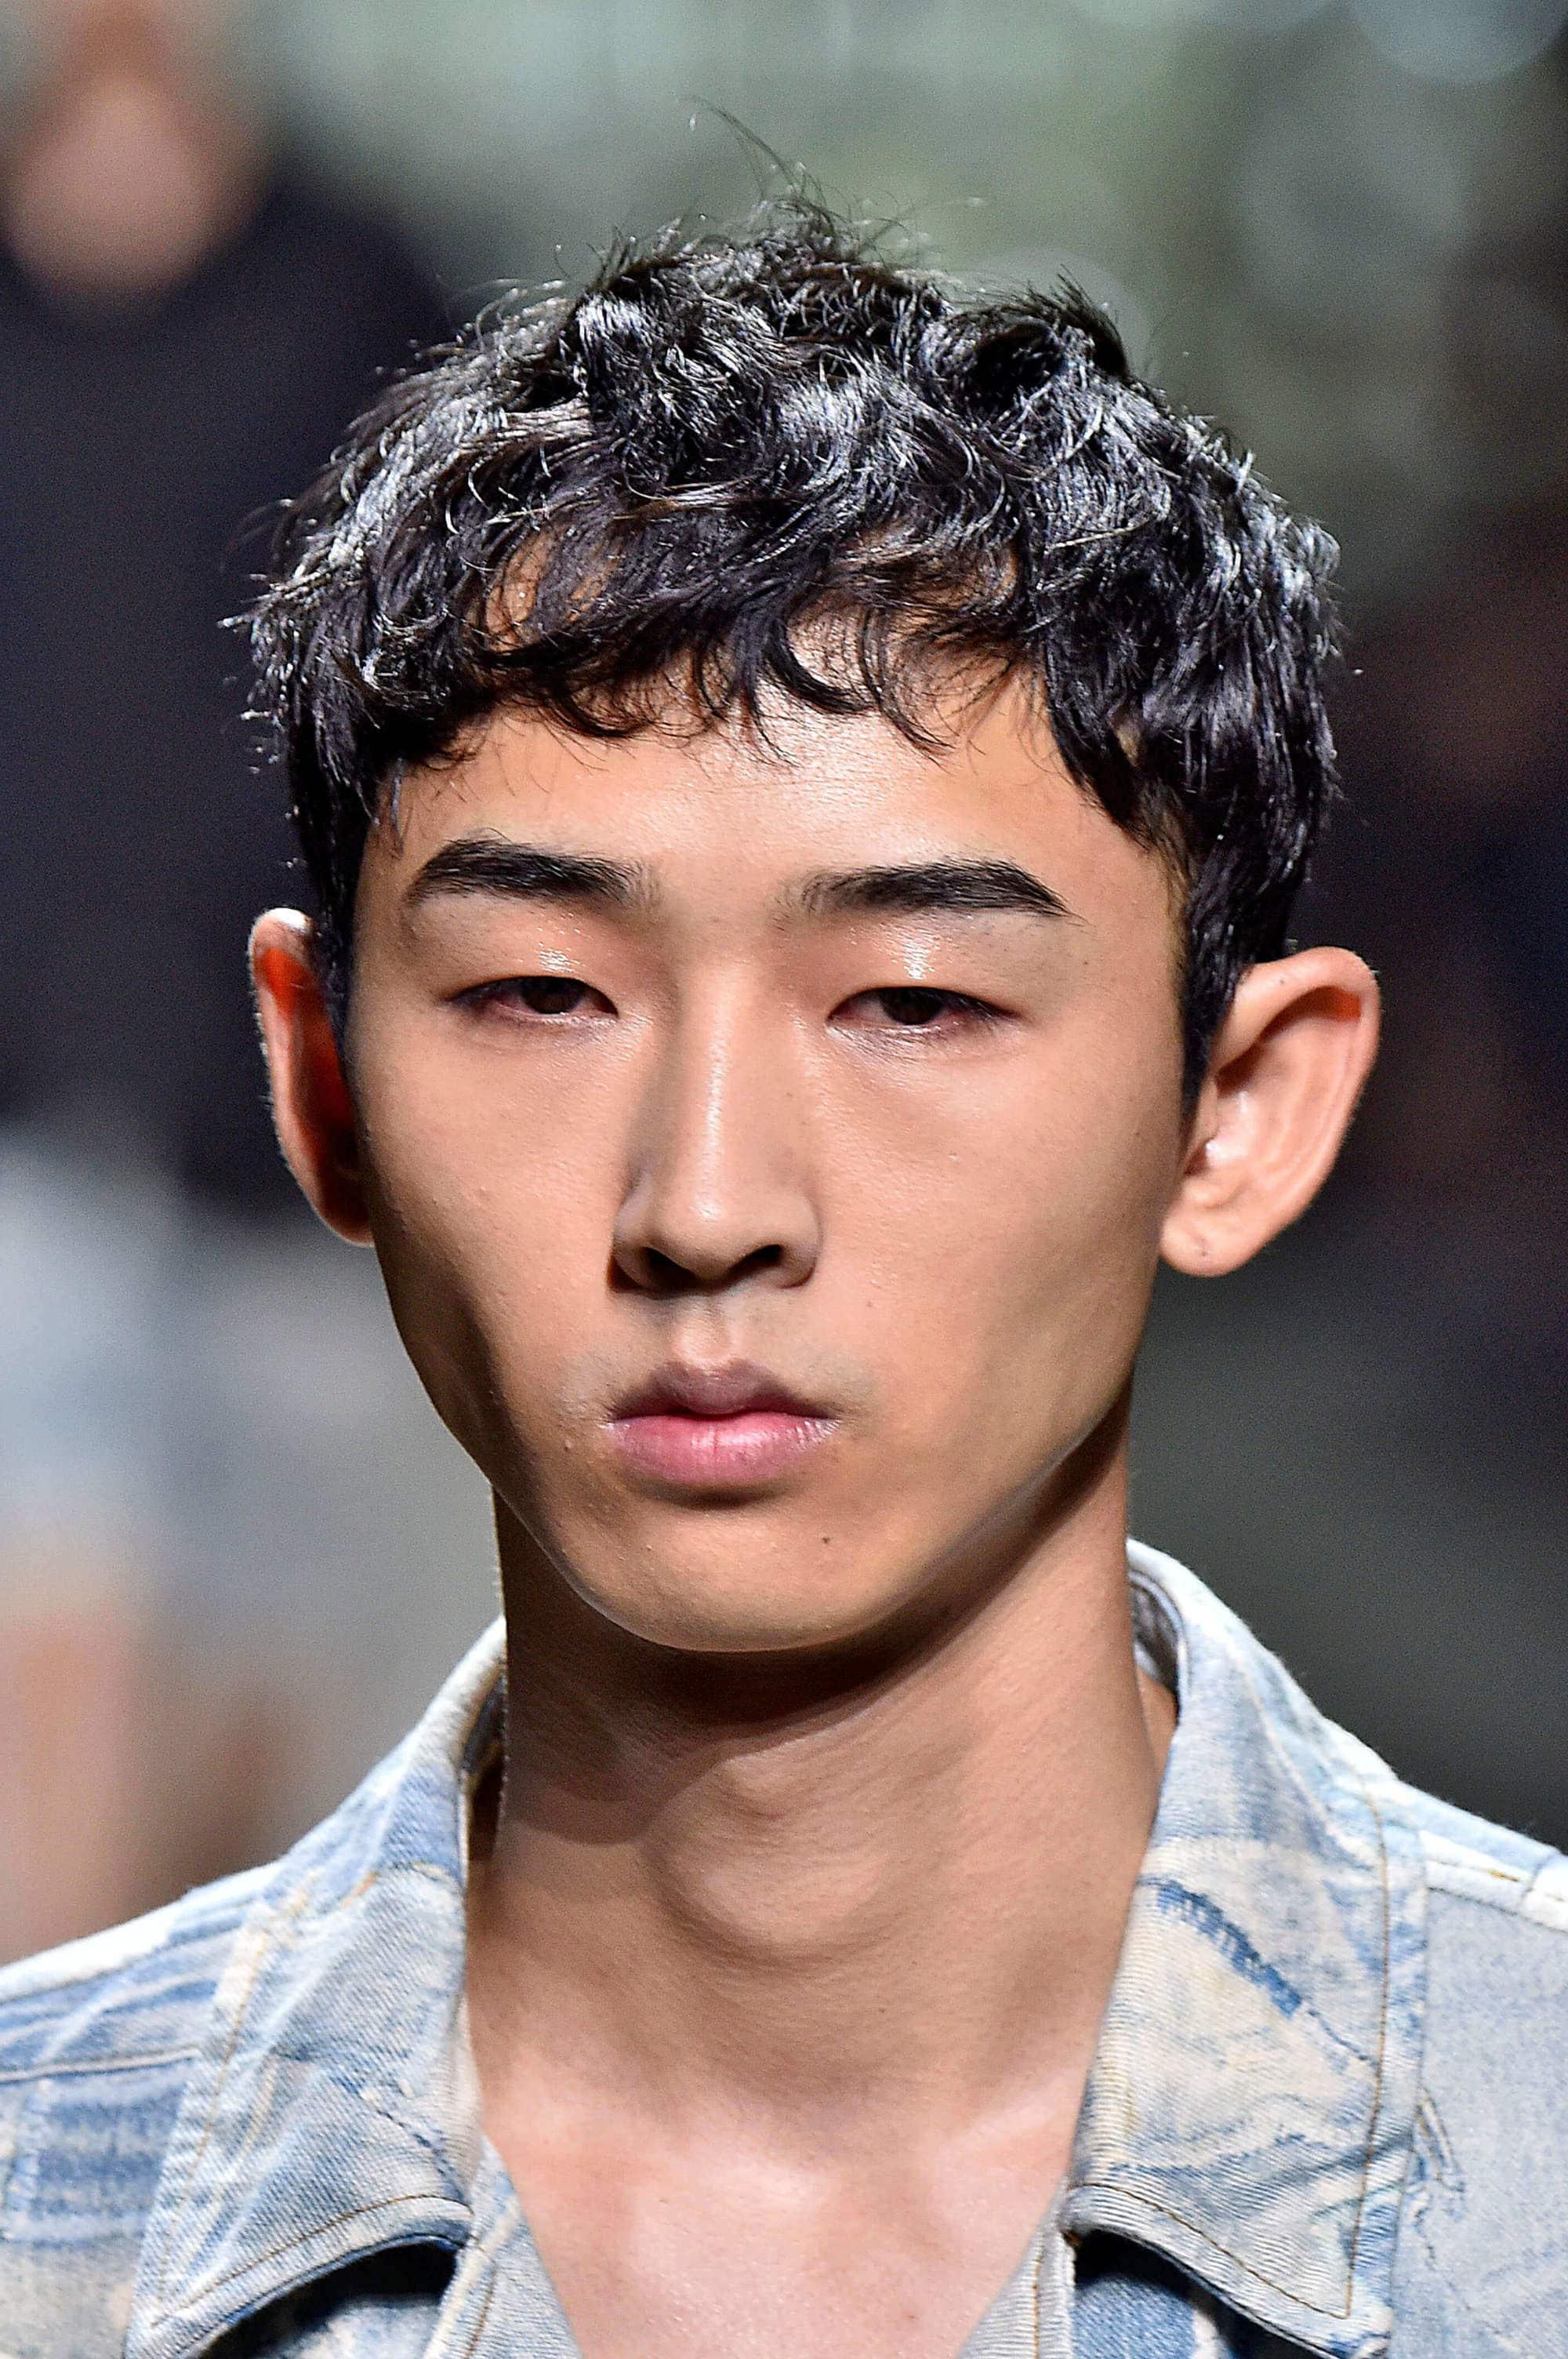 7 Handsome Curly Men's Undercut Hairstyles Throughout Undercut Hairstyles For Curly Hair (View 25 of 25)